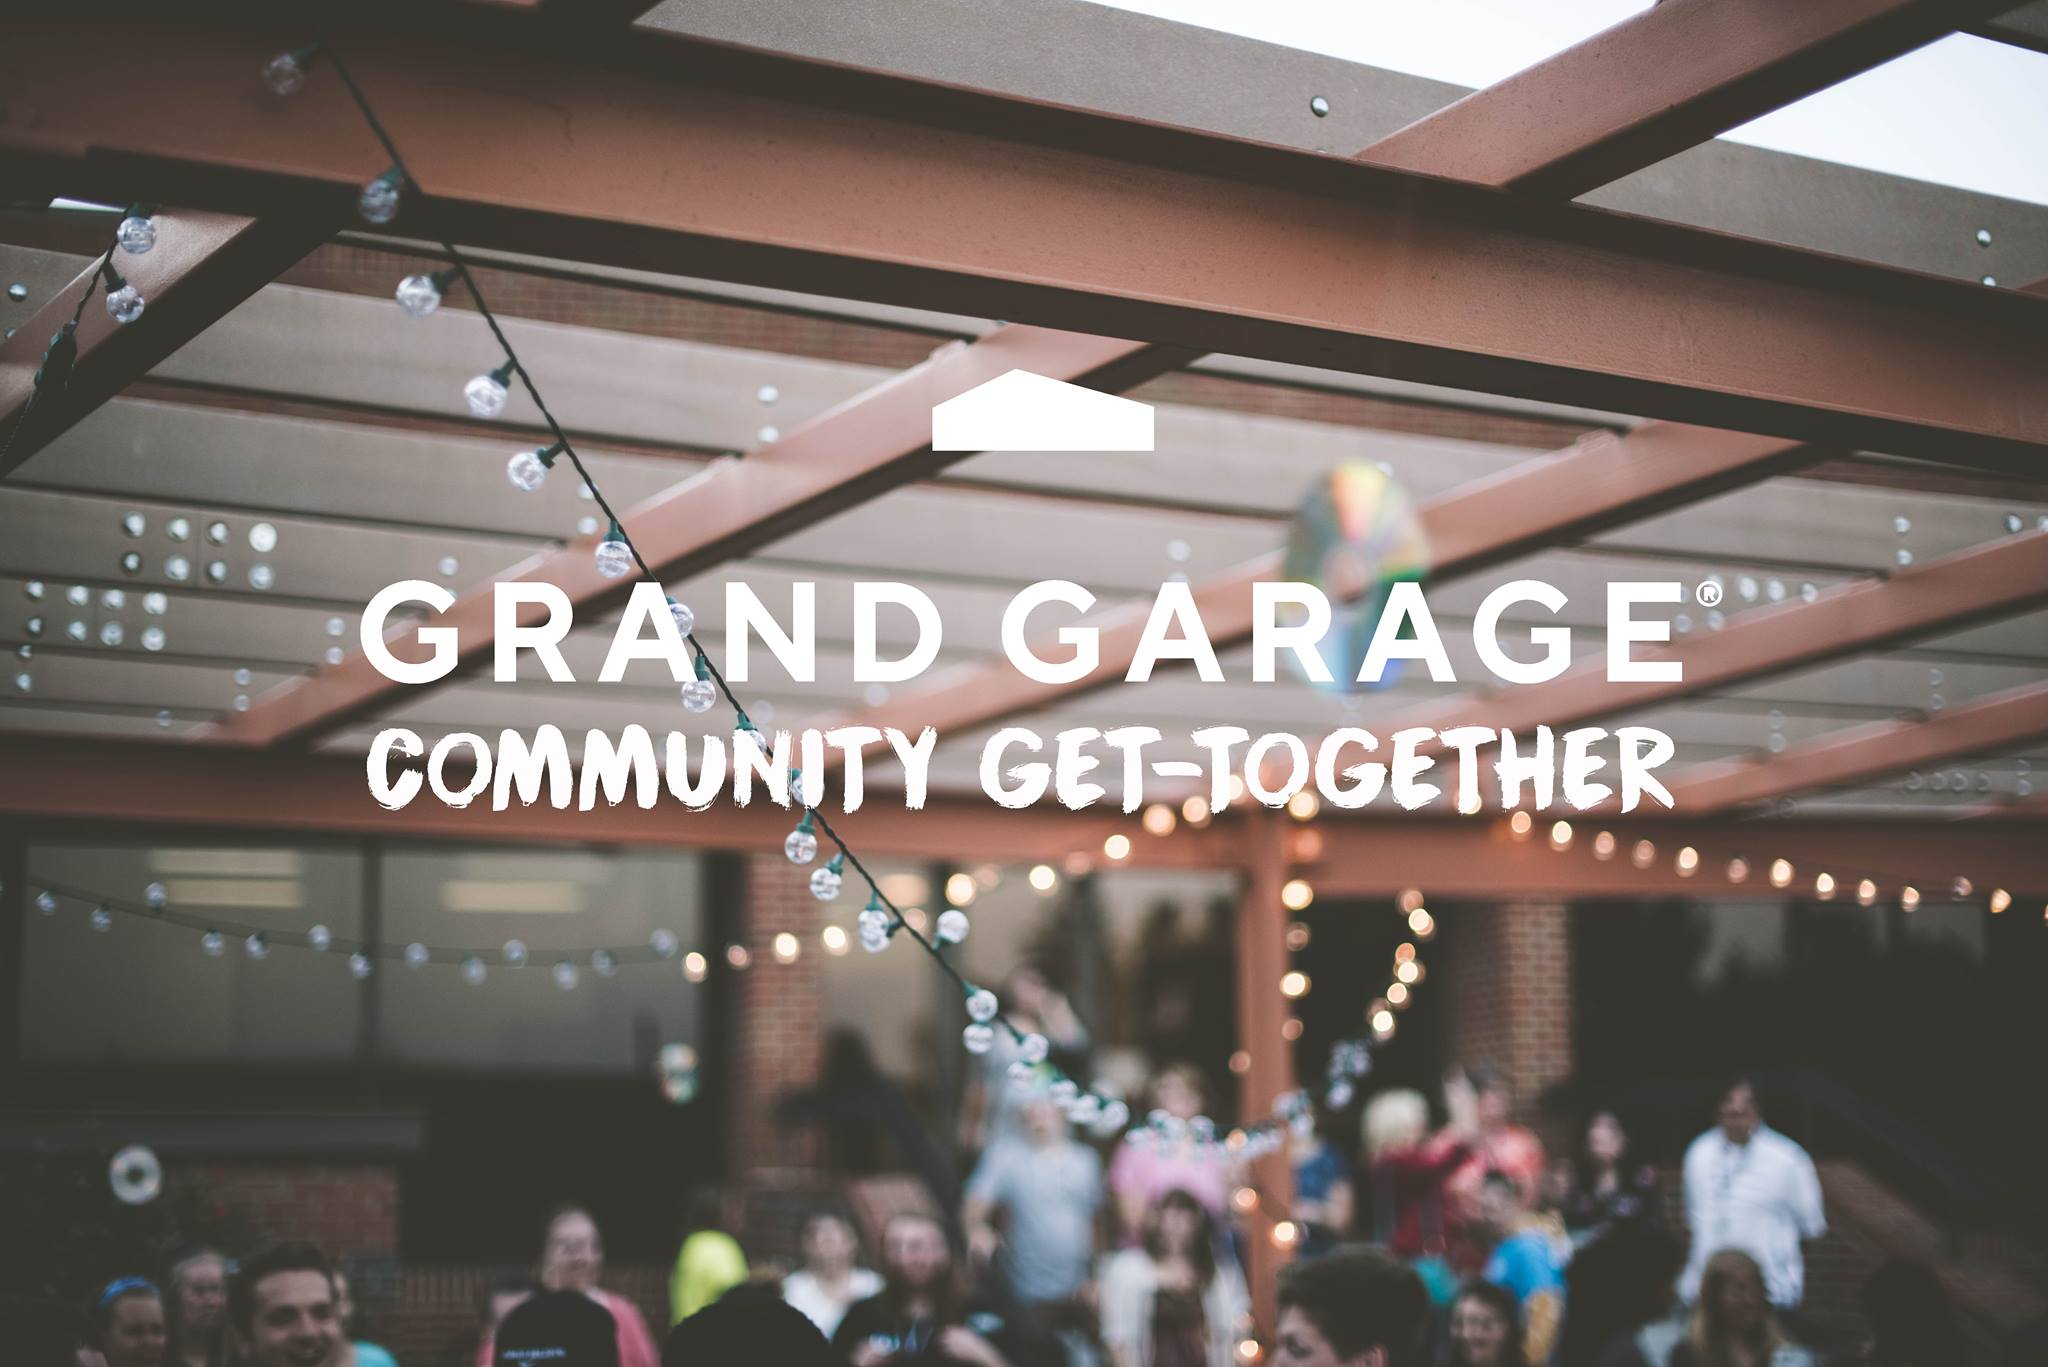 Tabakfabrik linz community get together in der grand garage for Grand garage biterrois